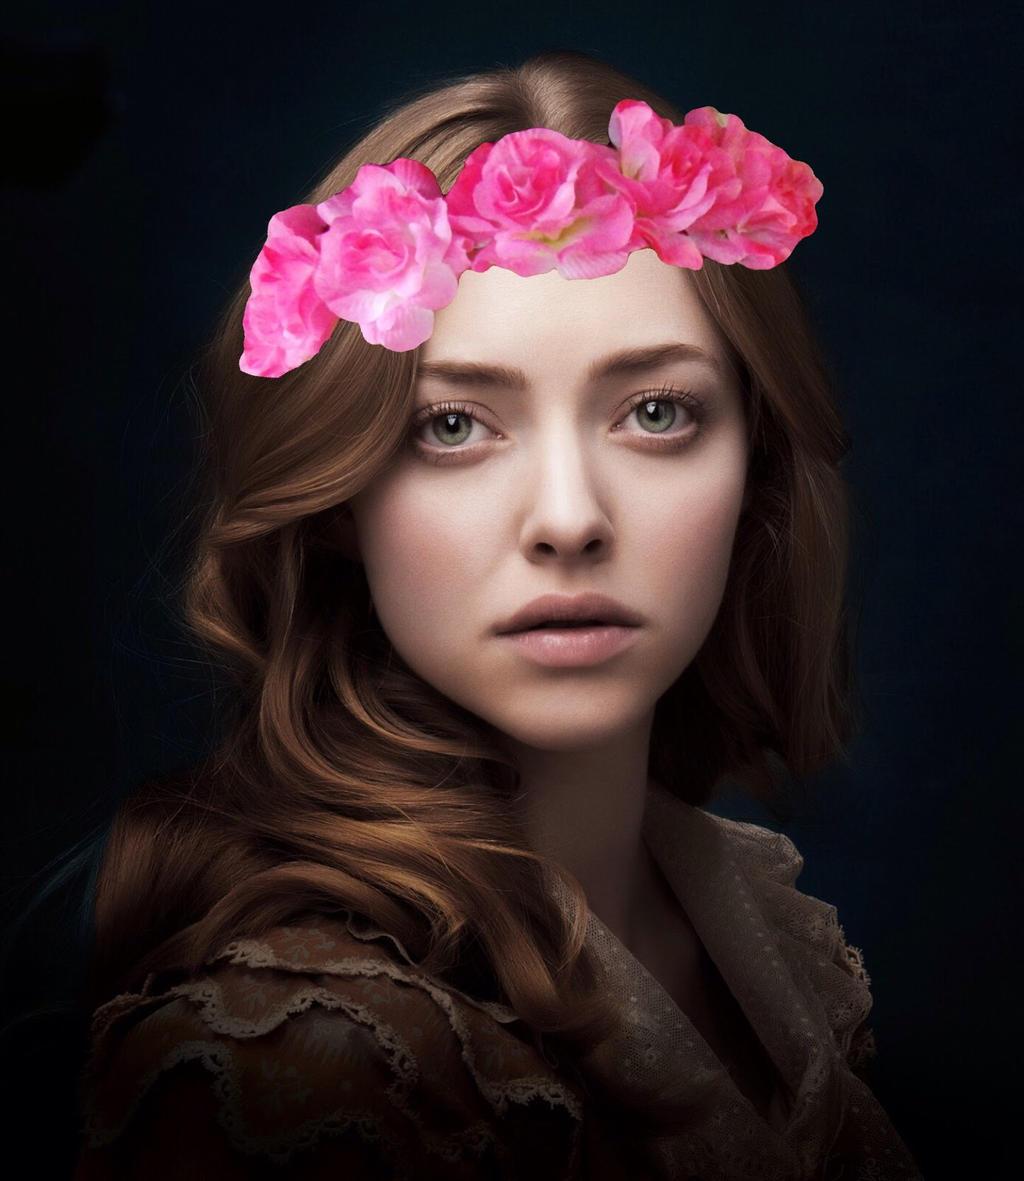 Flower crown tumblr fandom comousar flower crown tumblr fandom by fandom flower crowns izmirmasajfo